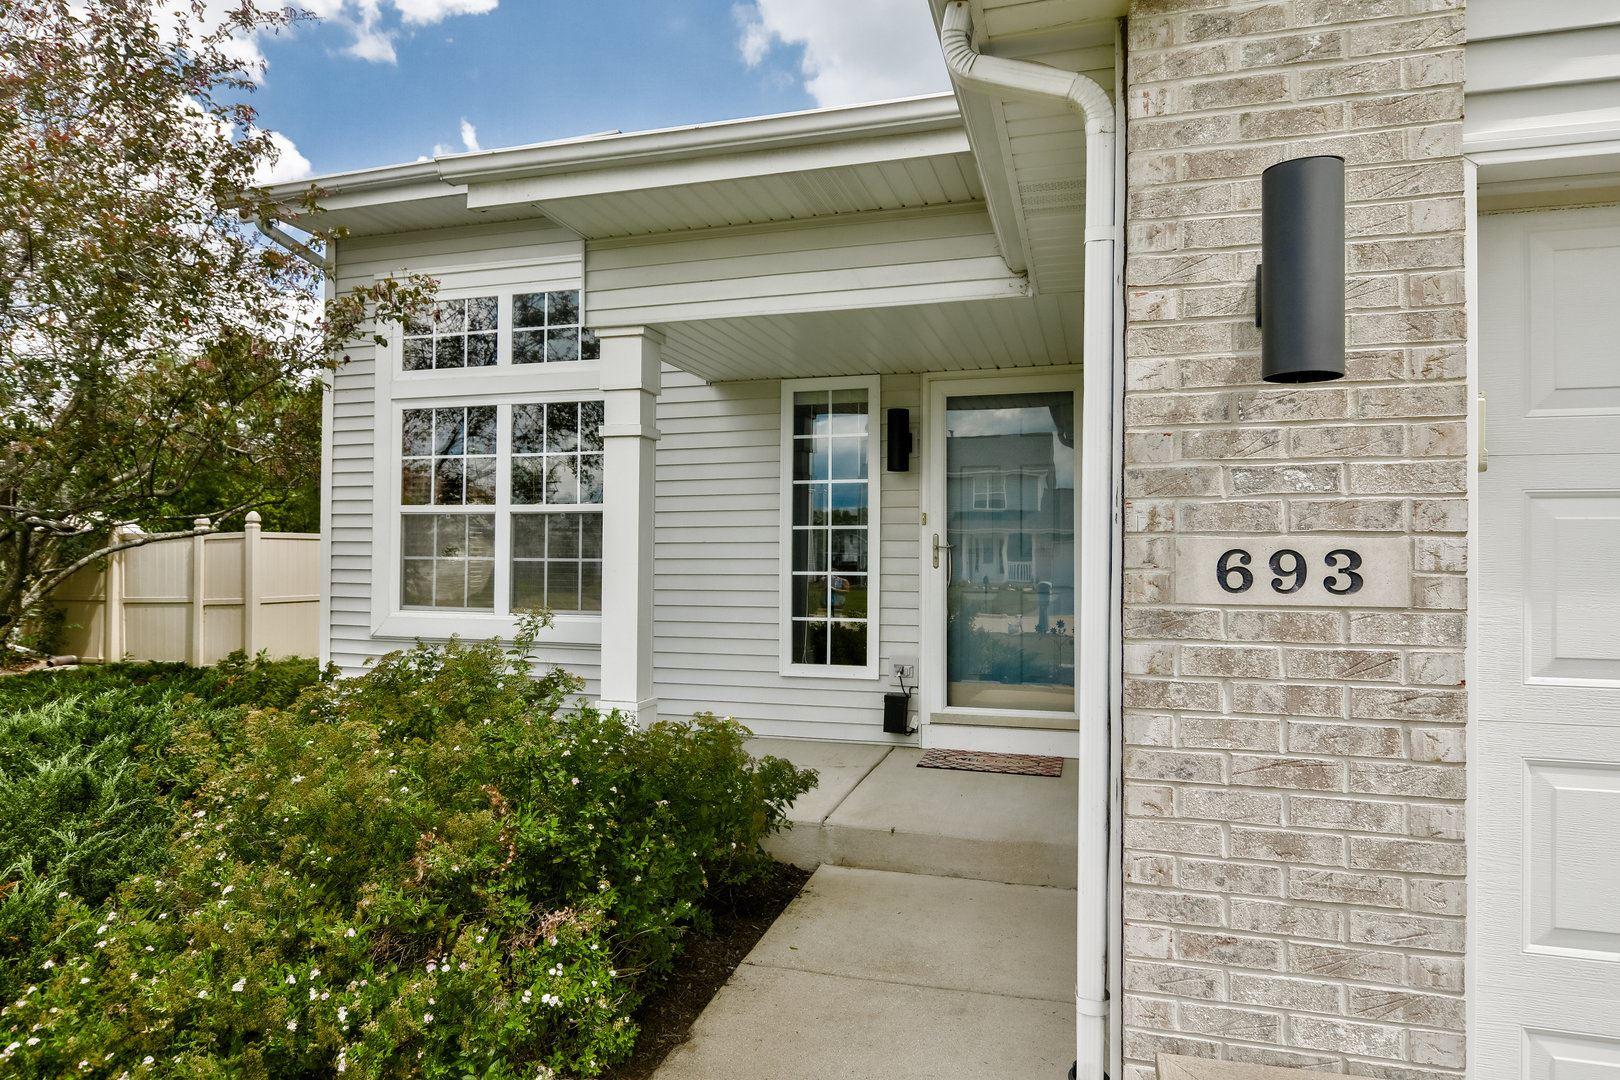 693 BayField Road, Rockton, IL 61072 - #: 10813181